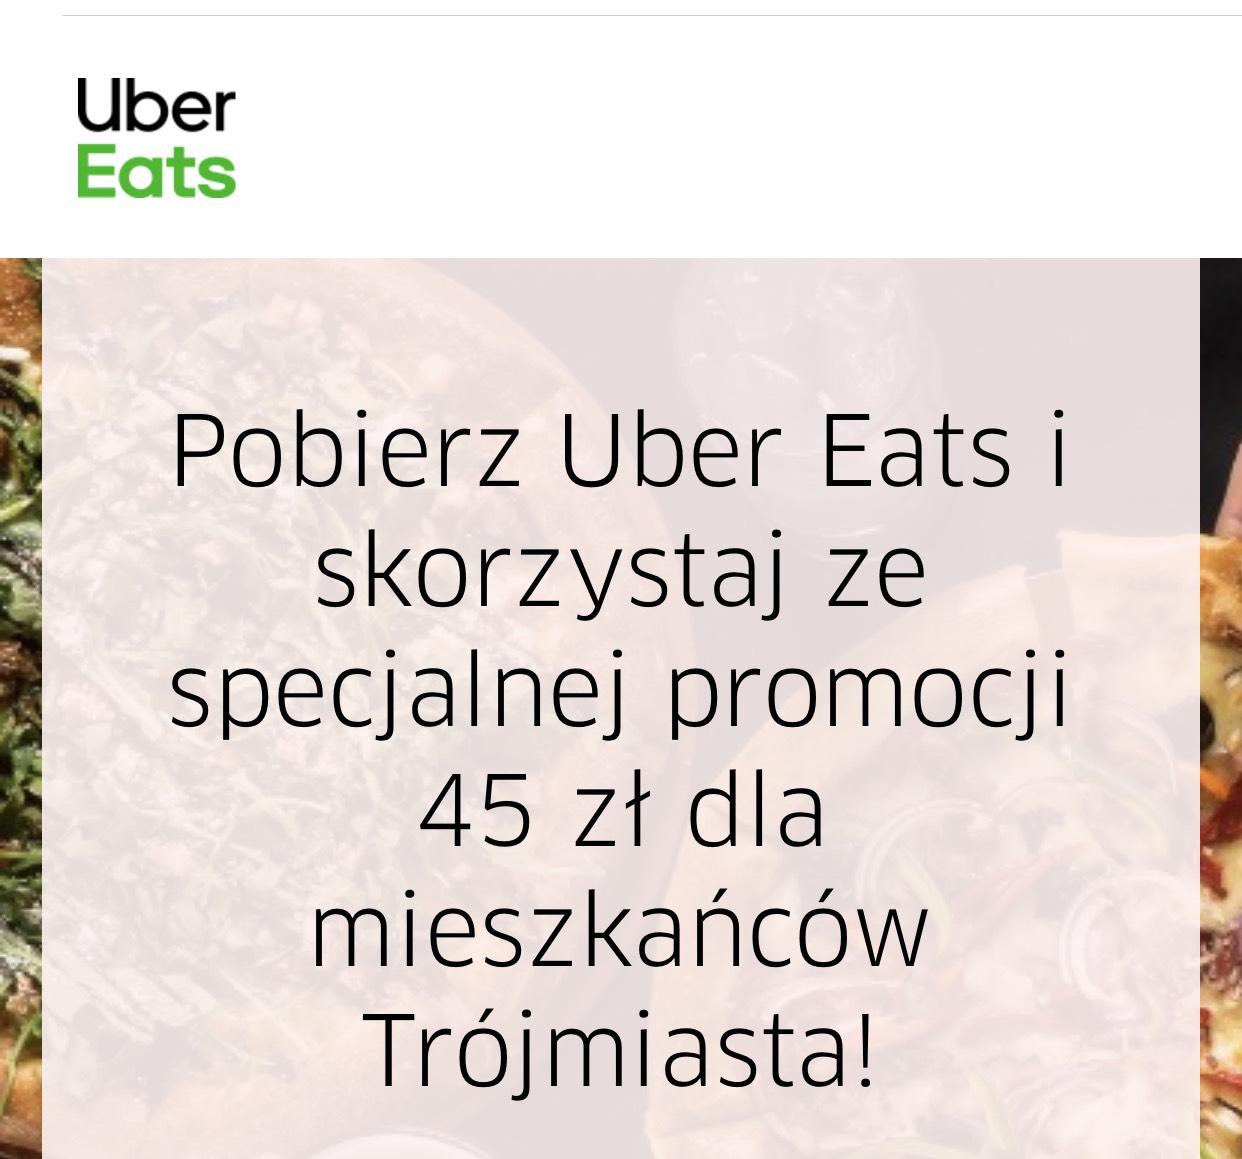 3x 15zl Uber Eats Gdynia